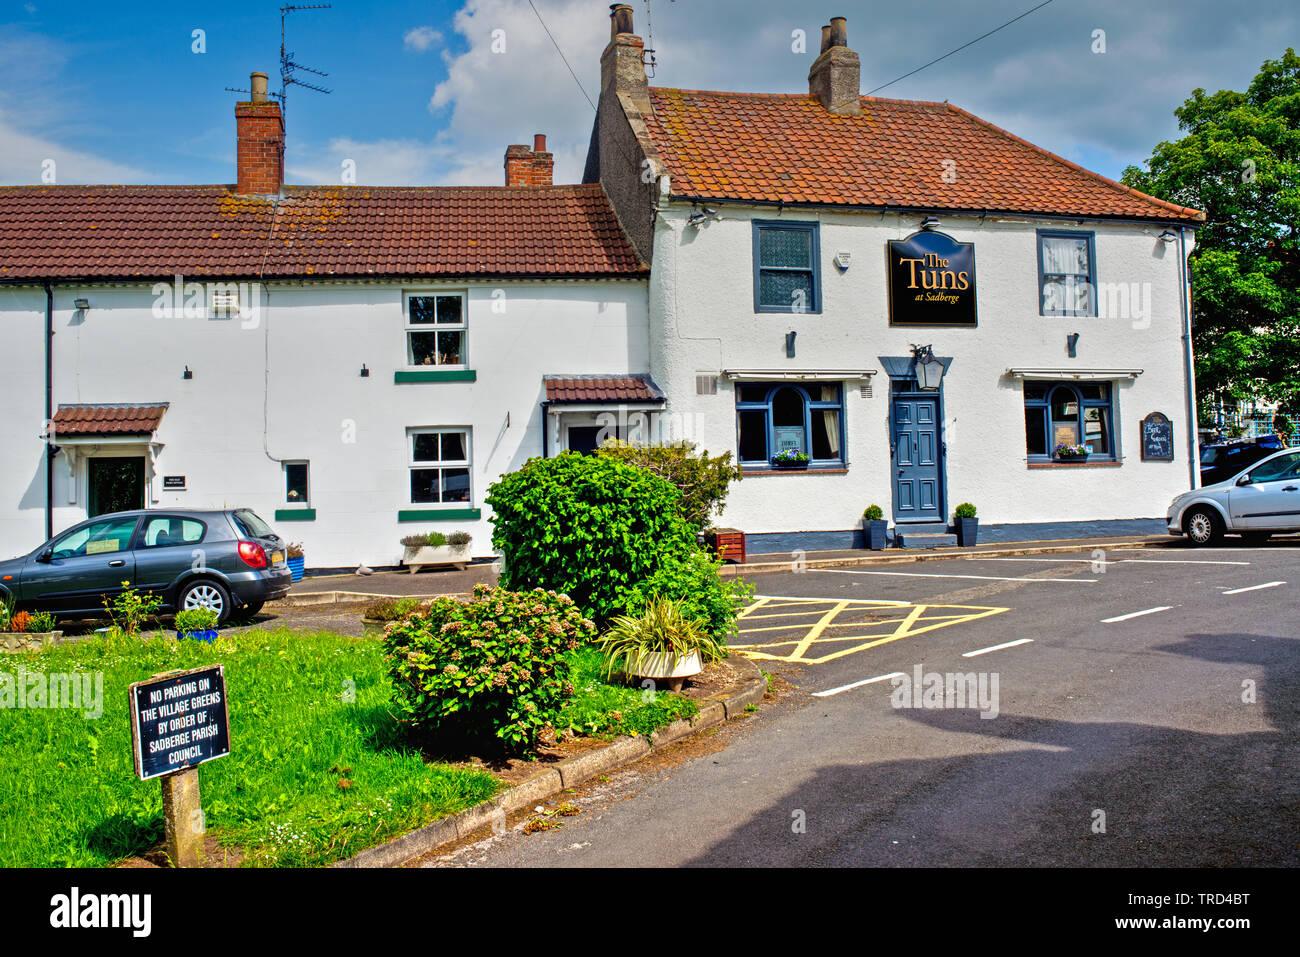 The Tuns Inn, Sadberge, Borough of Darlington, England Stock Photo